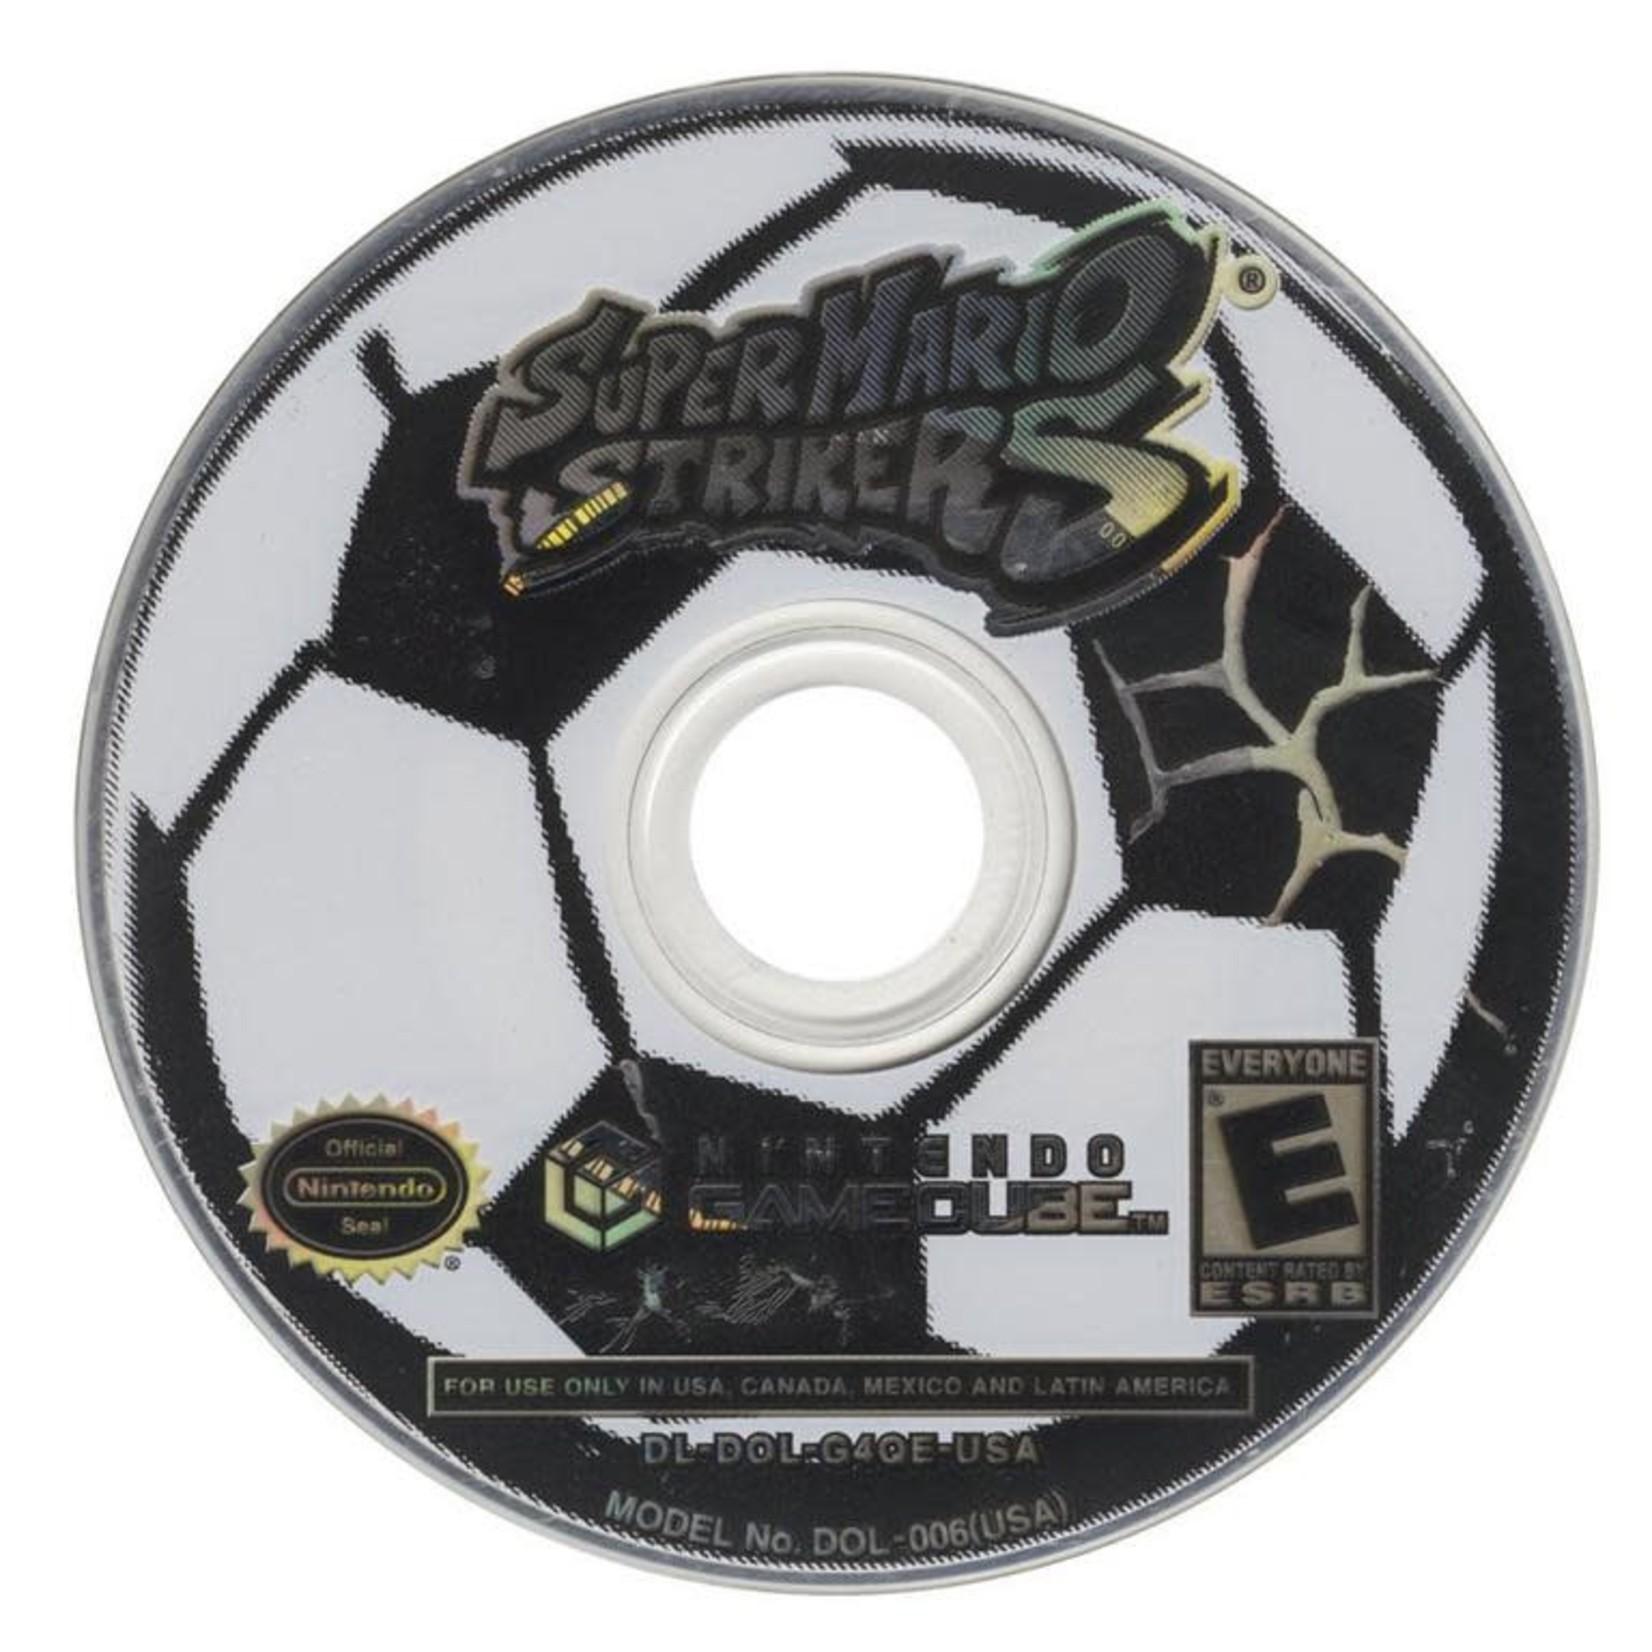 GCU-Super Mario Strikers (Disc)